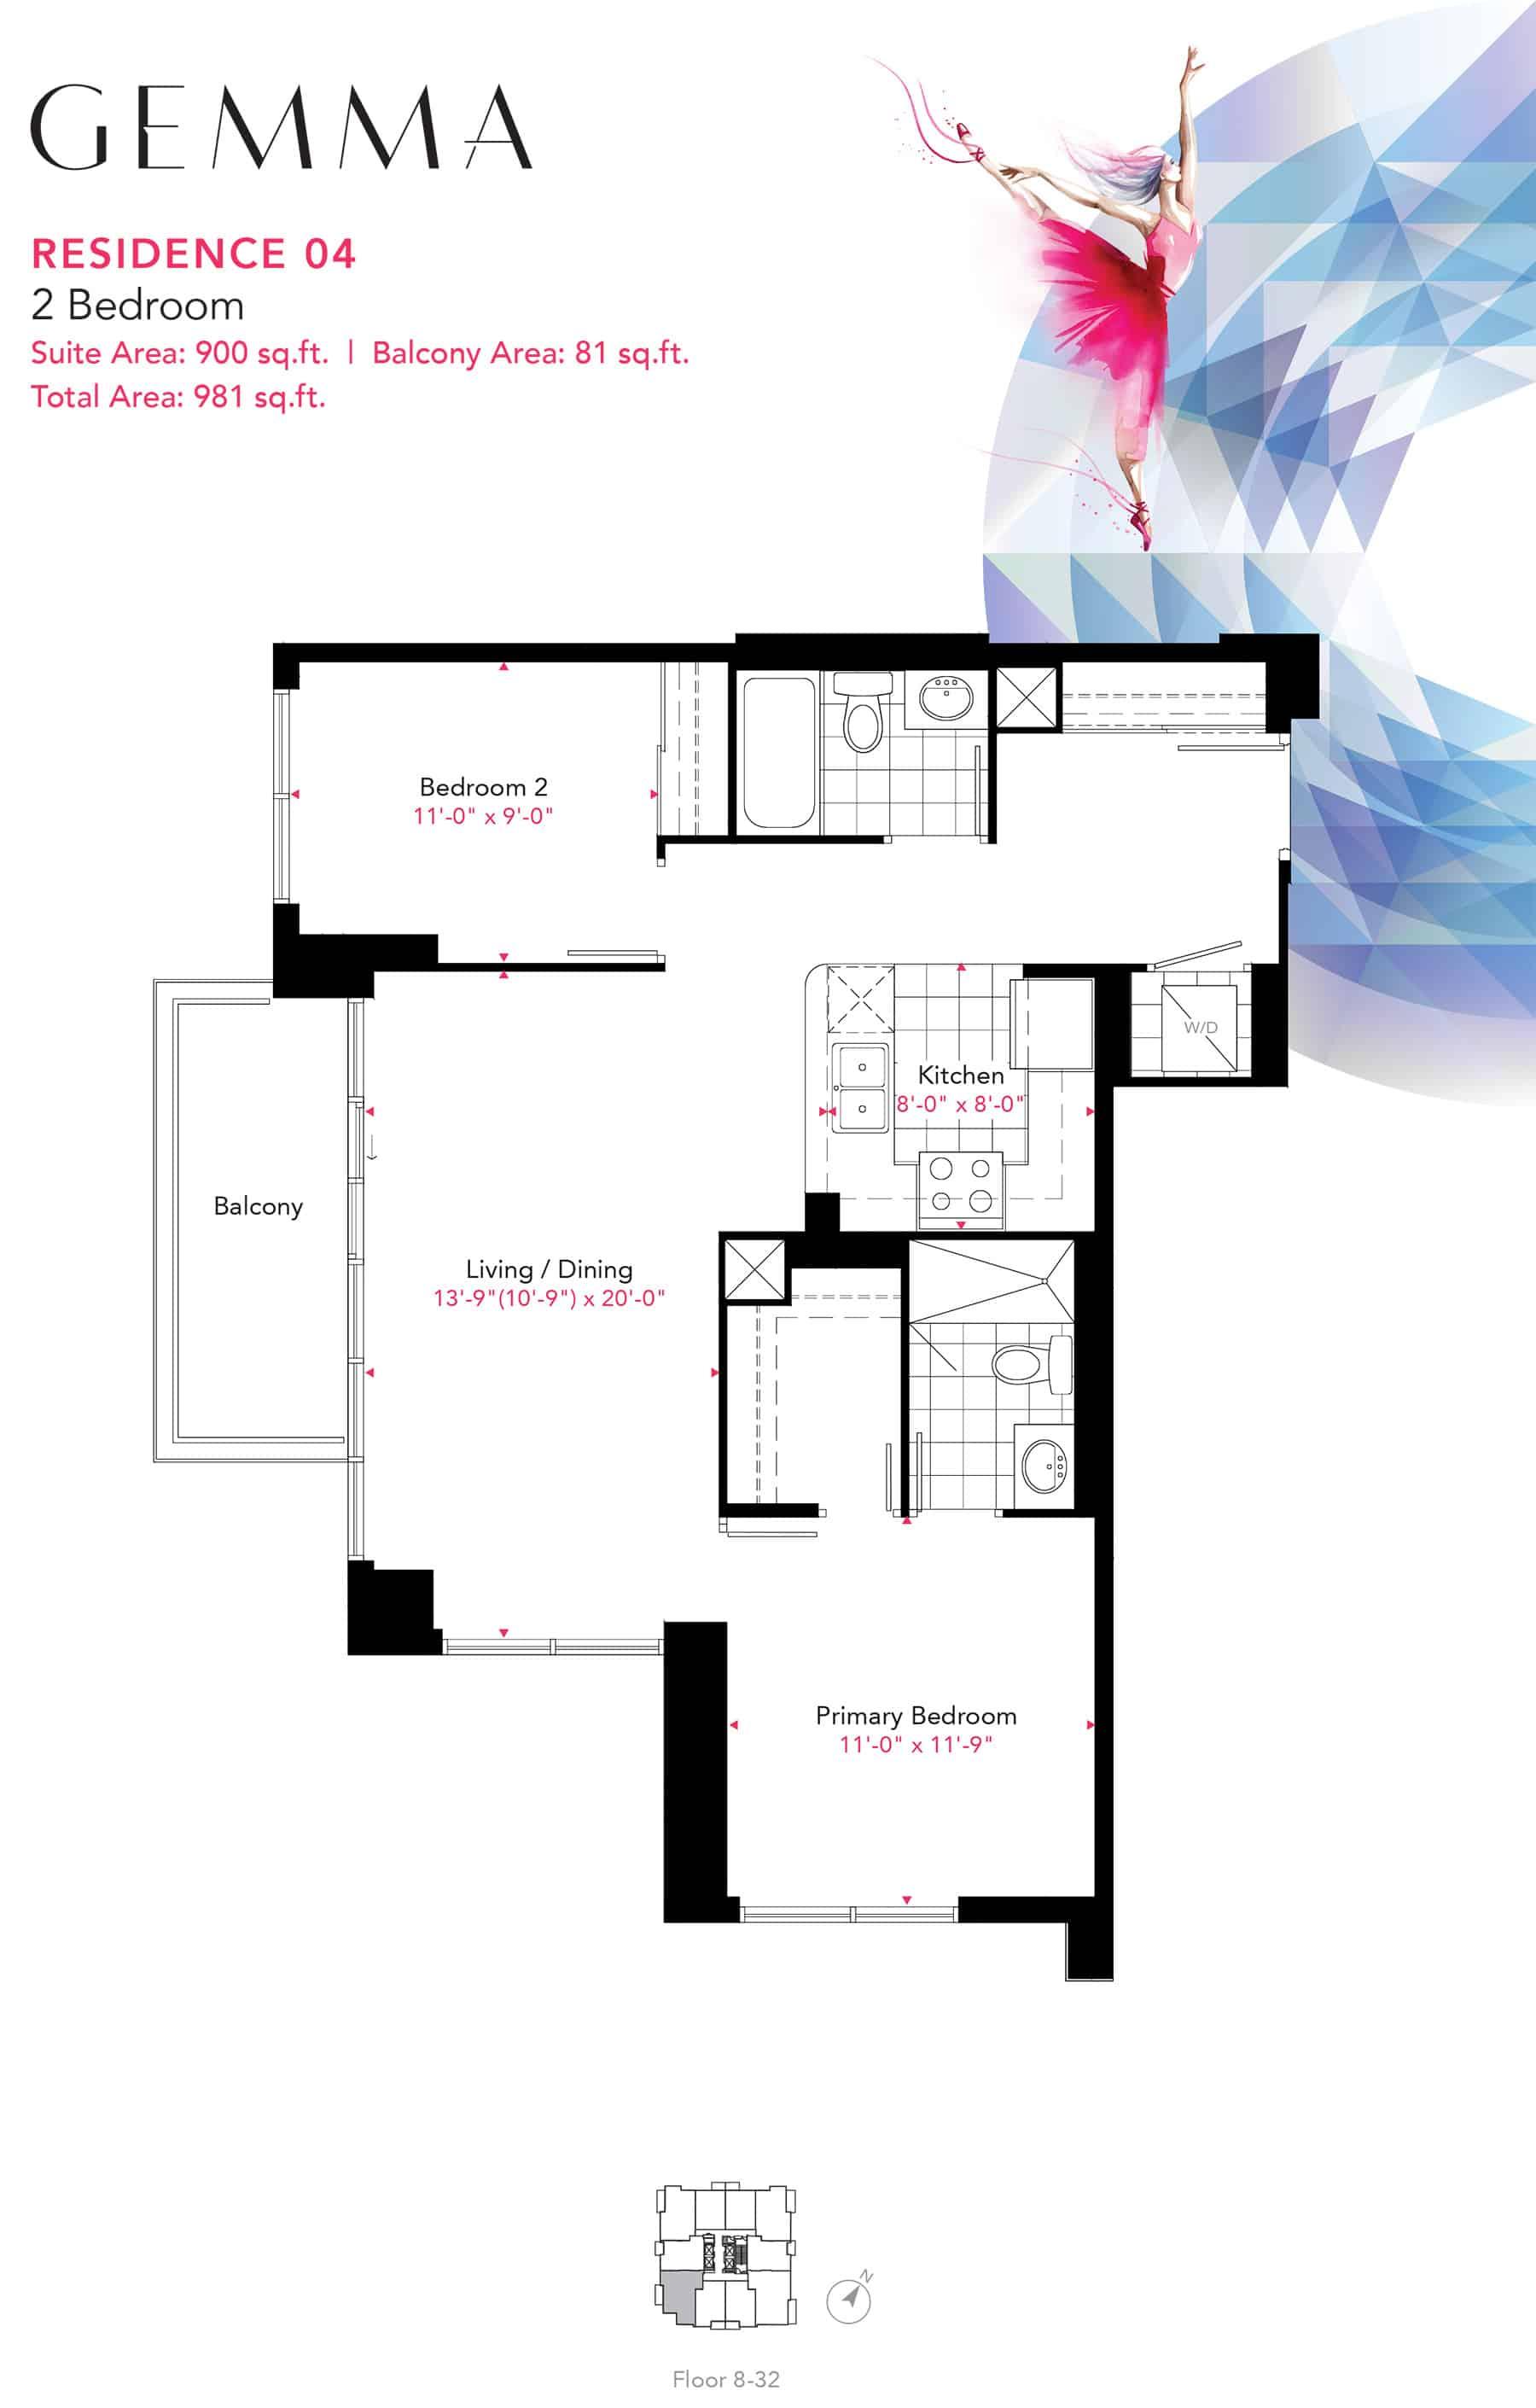 Residence-04-2B-900-Sqft-Gemma  Gemma Condos Residence 04 2B 900 Sqft Gemma